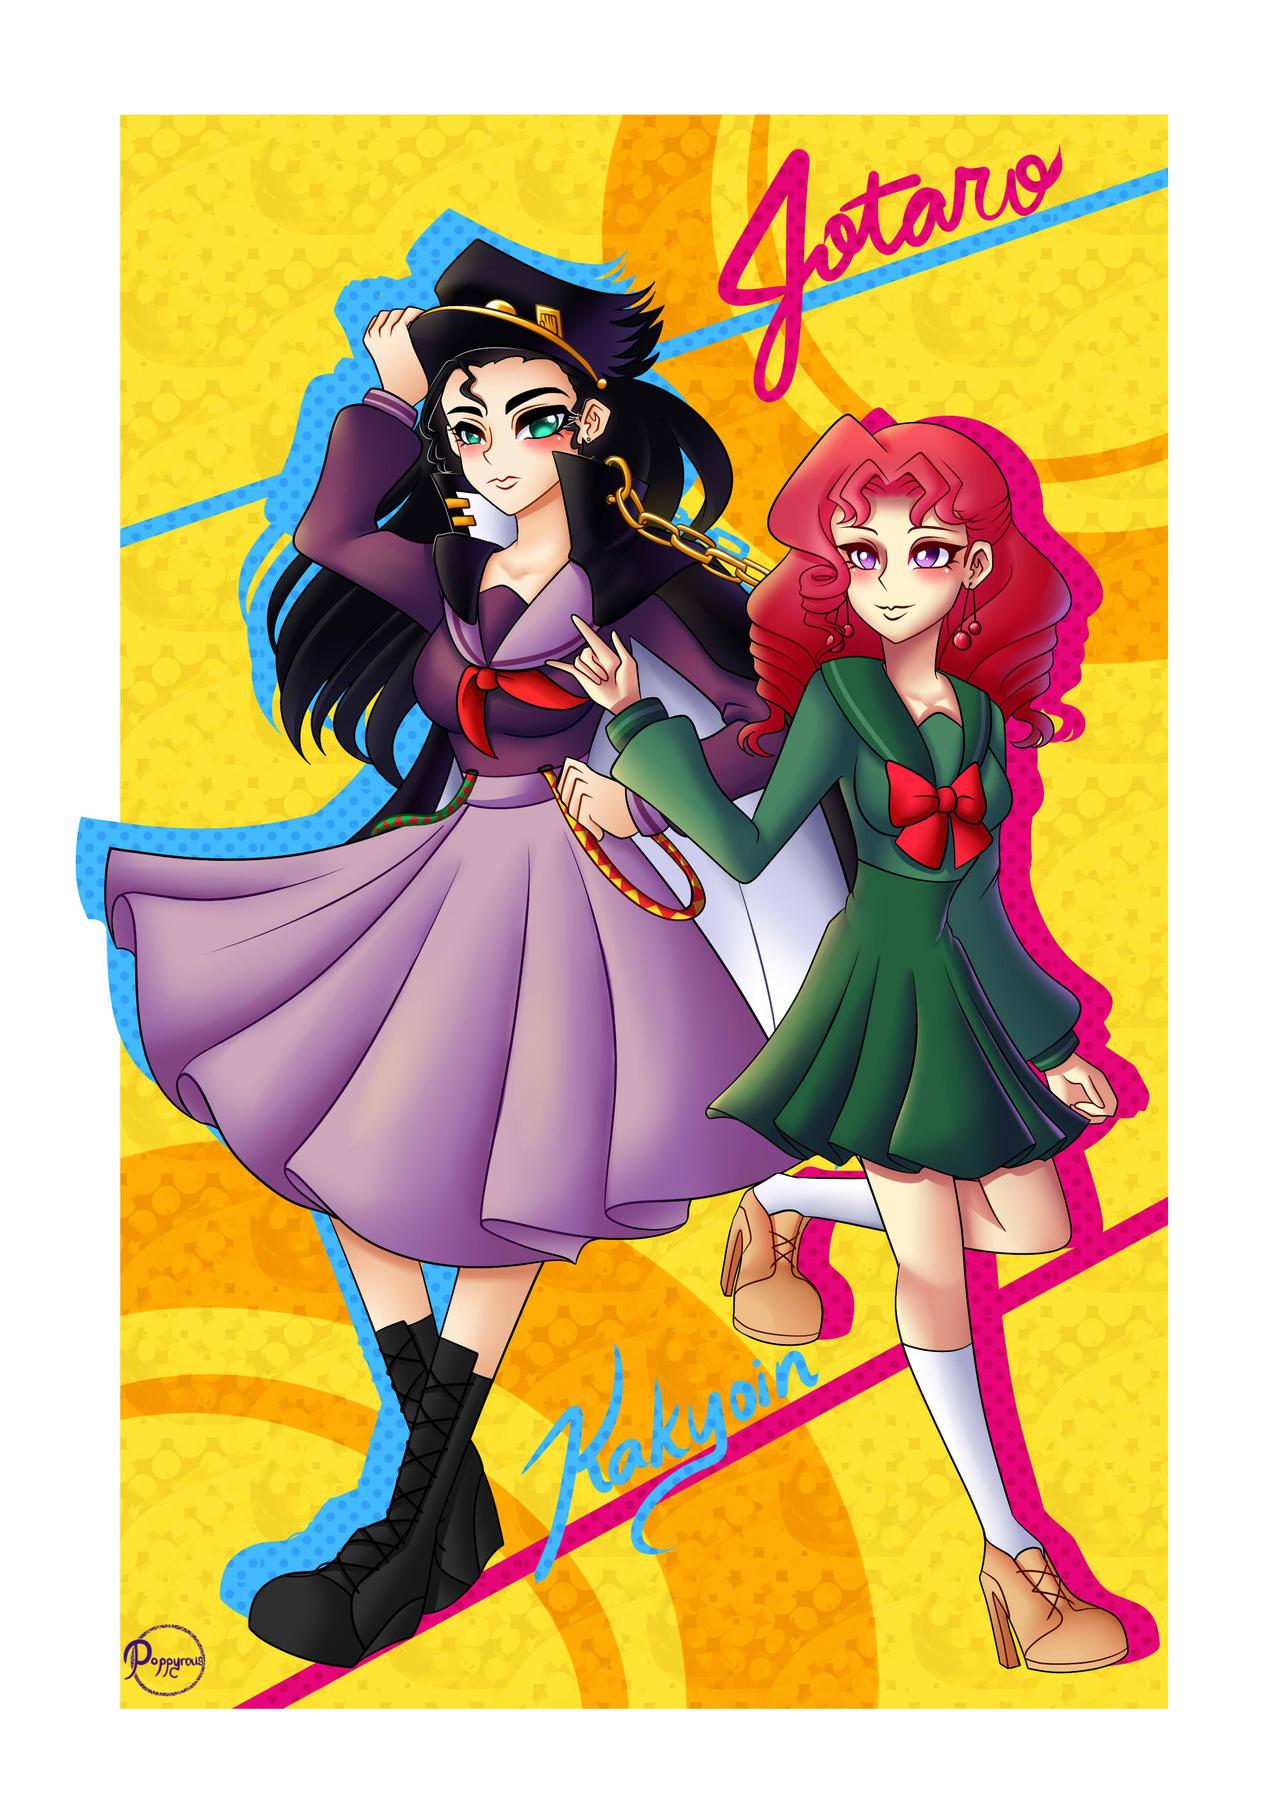 Fem!Jotaro and Kakyoin